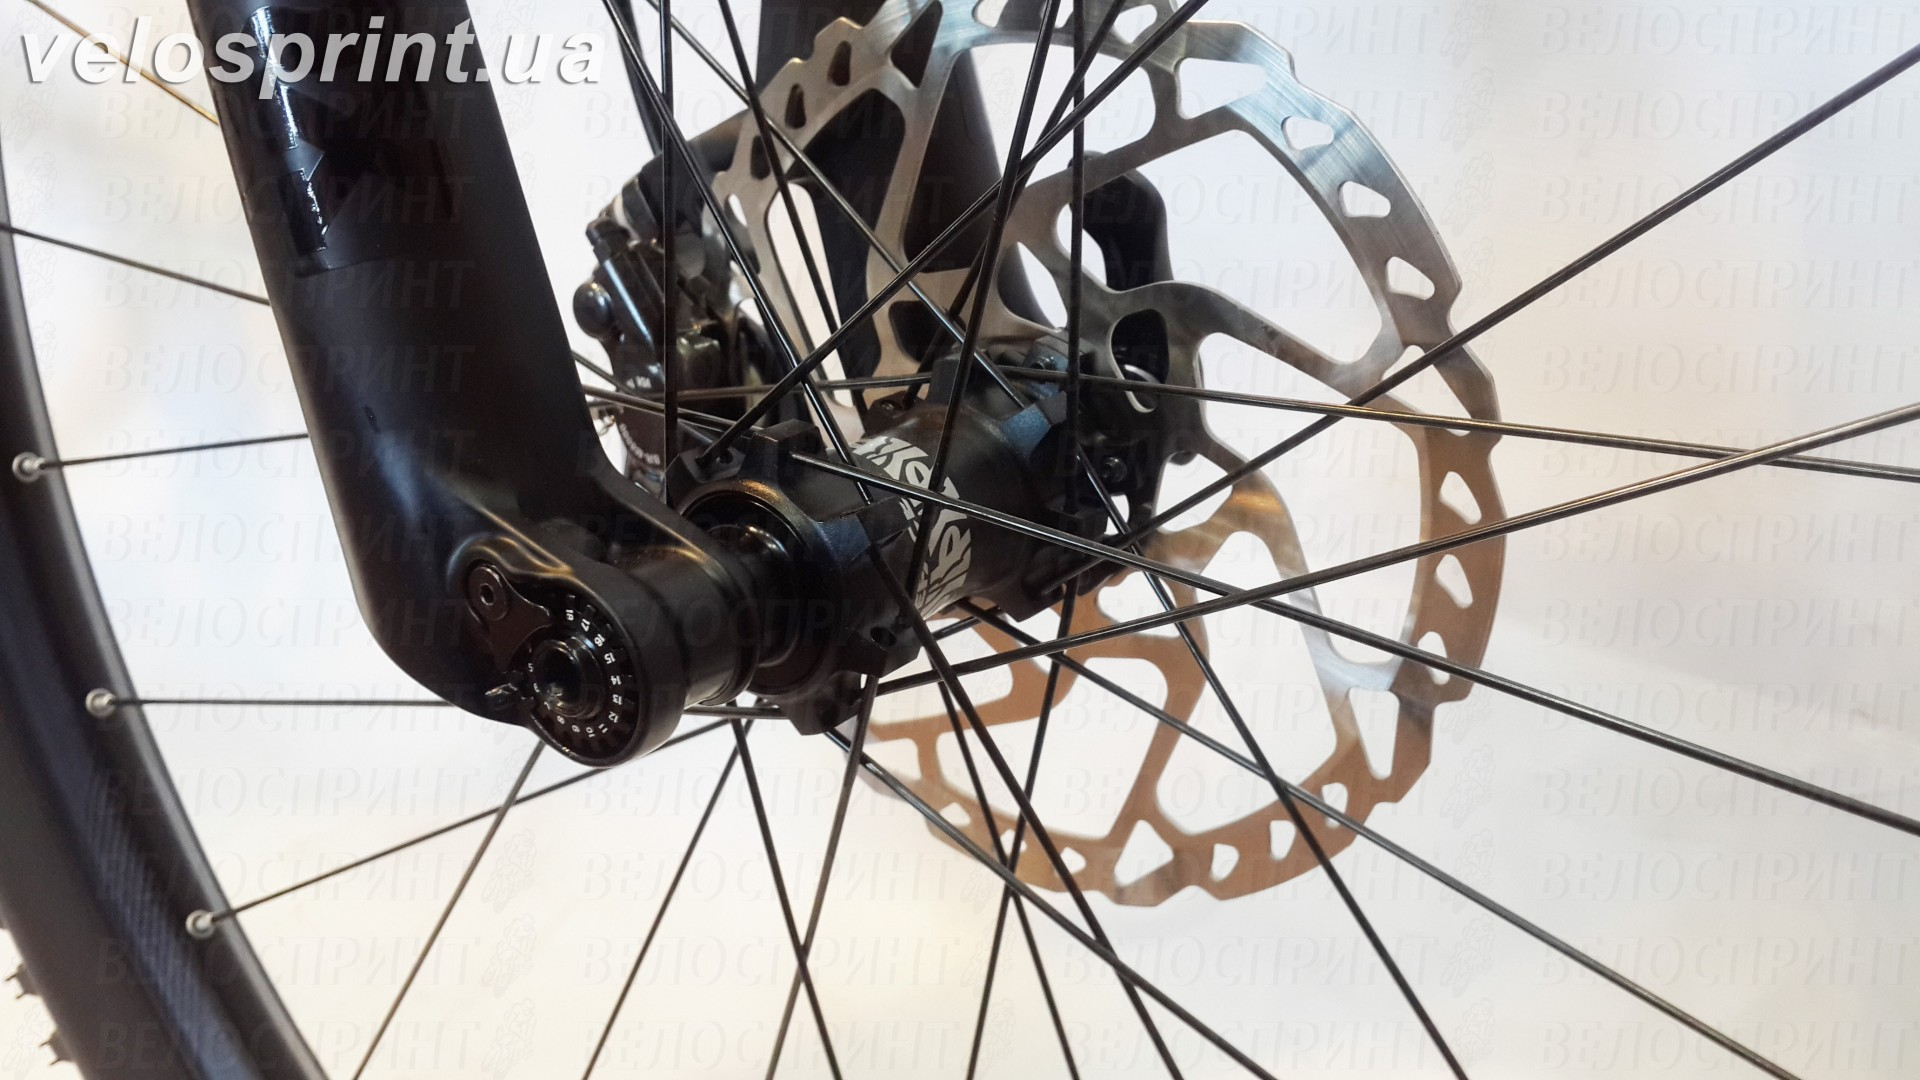 Велосипед GHOST Lector 6 LC 29 titaniumgrey/nightblack/riotgreen втулка год 2017